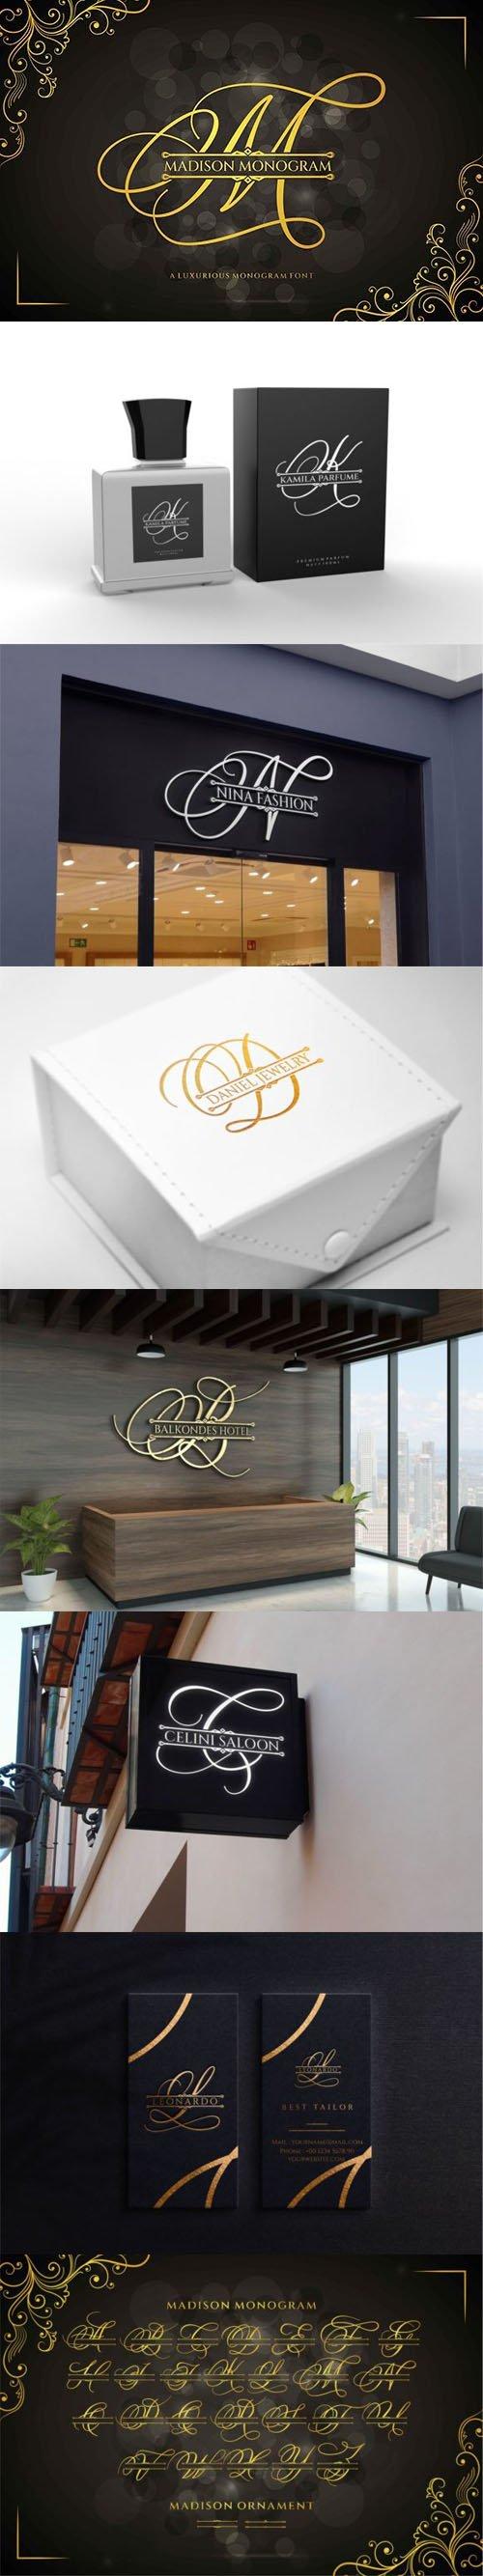 Madison Monogram - Calligraphy Display Font [2-Weights]